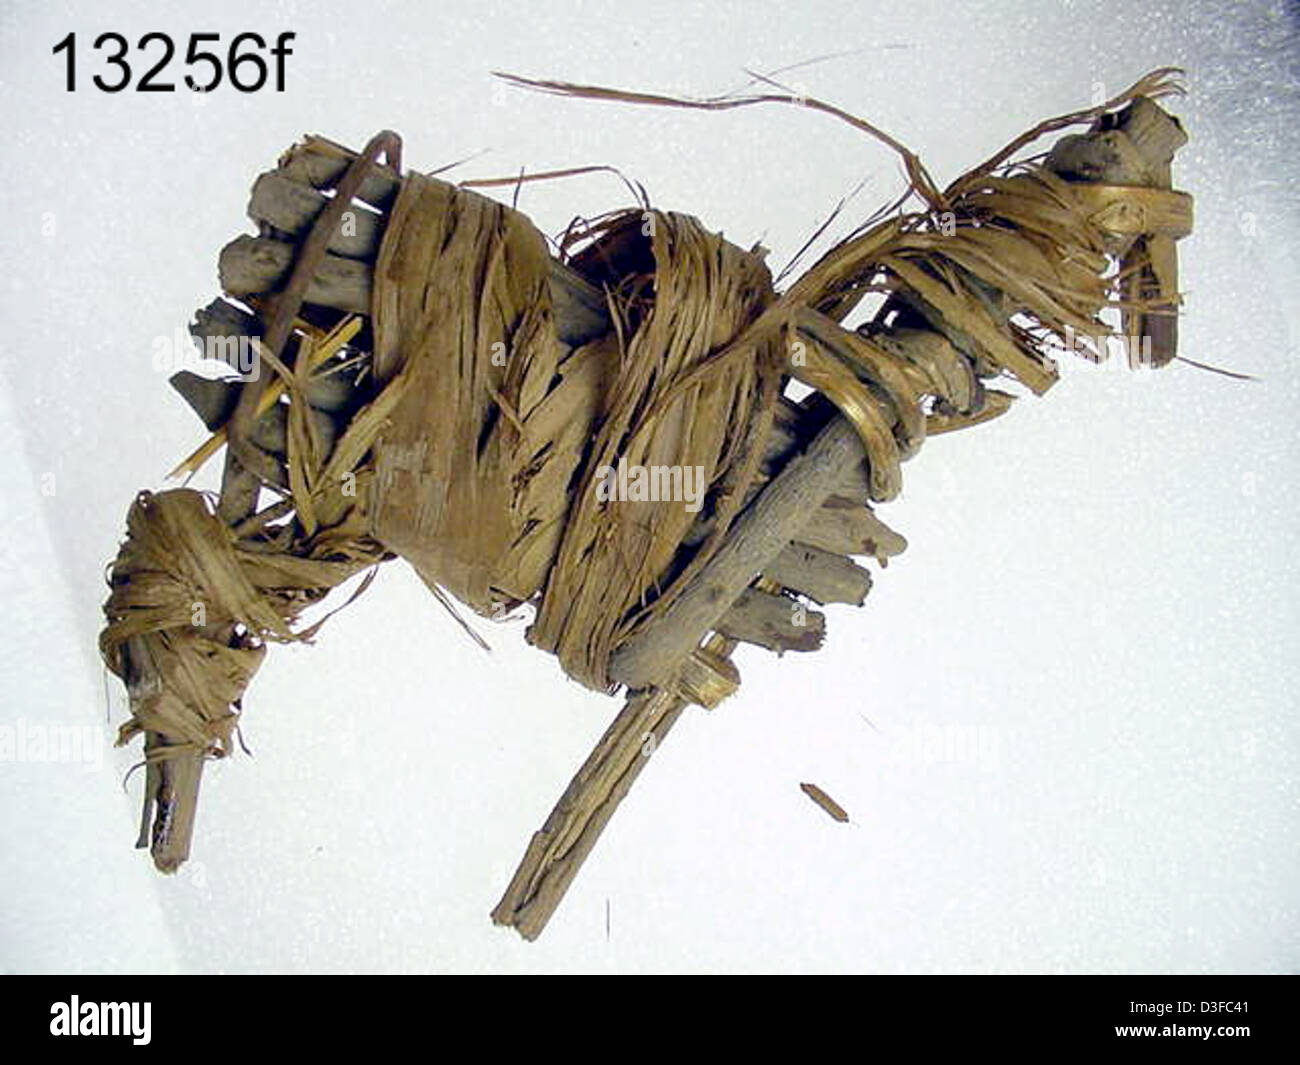 13256f Grand Canyon_Split-Twig Figurine - Stock Image